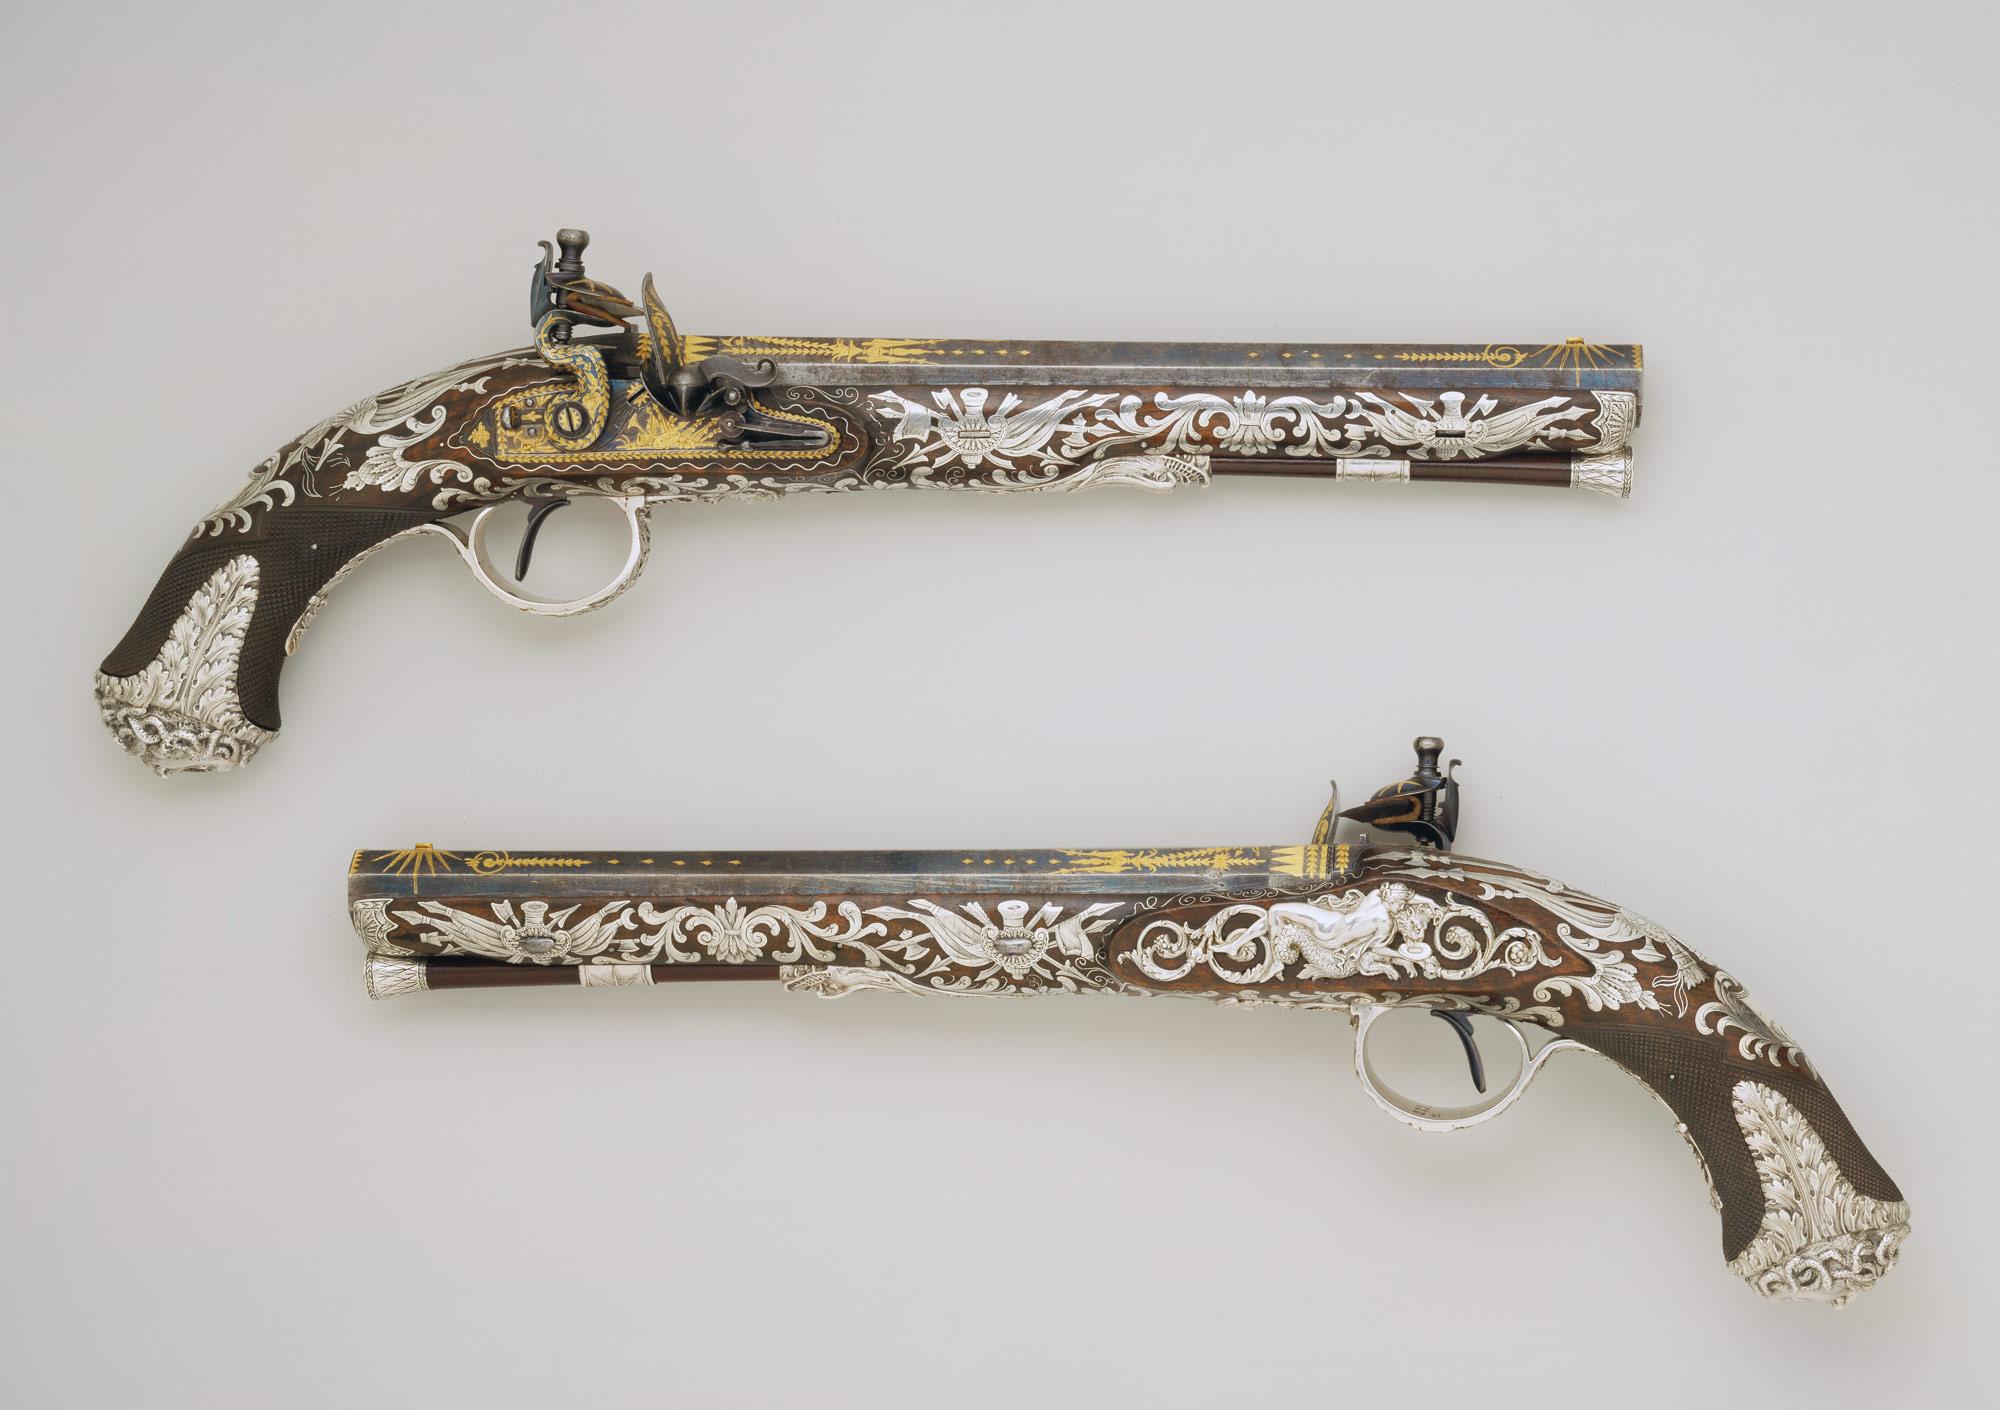 2000x1410 Pair Of Flintlock Pistols Samuel Brunn, Attributed To Michael